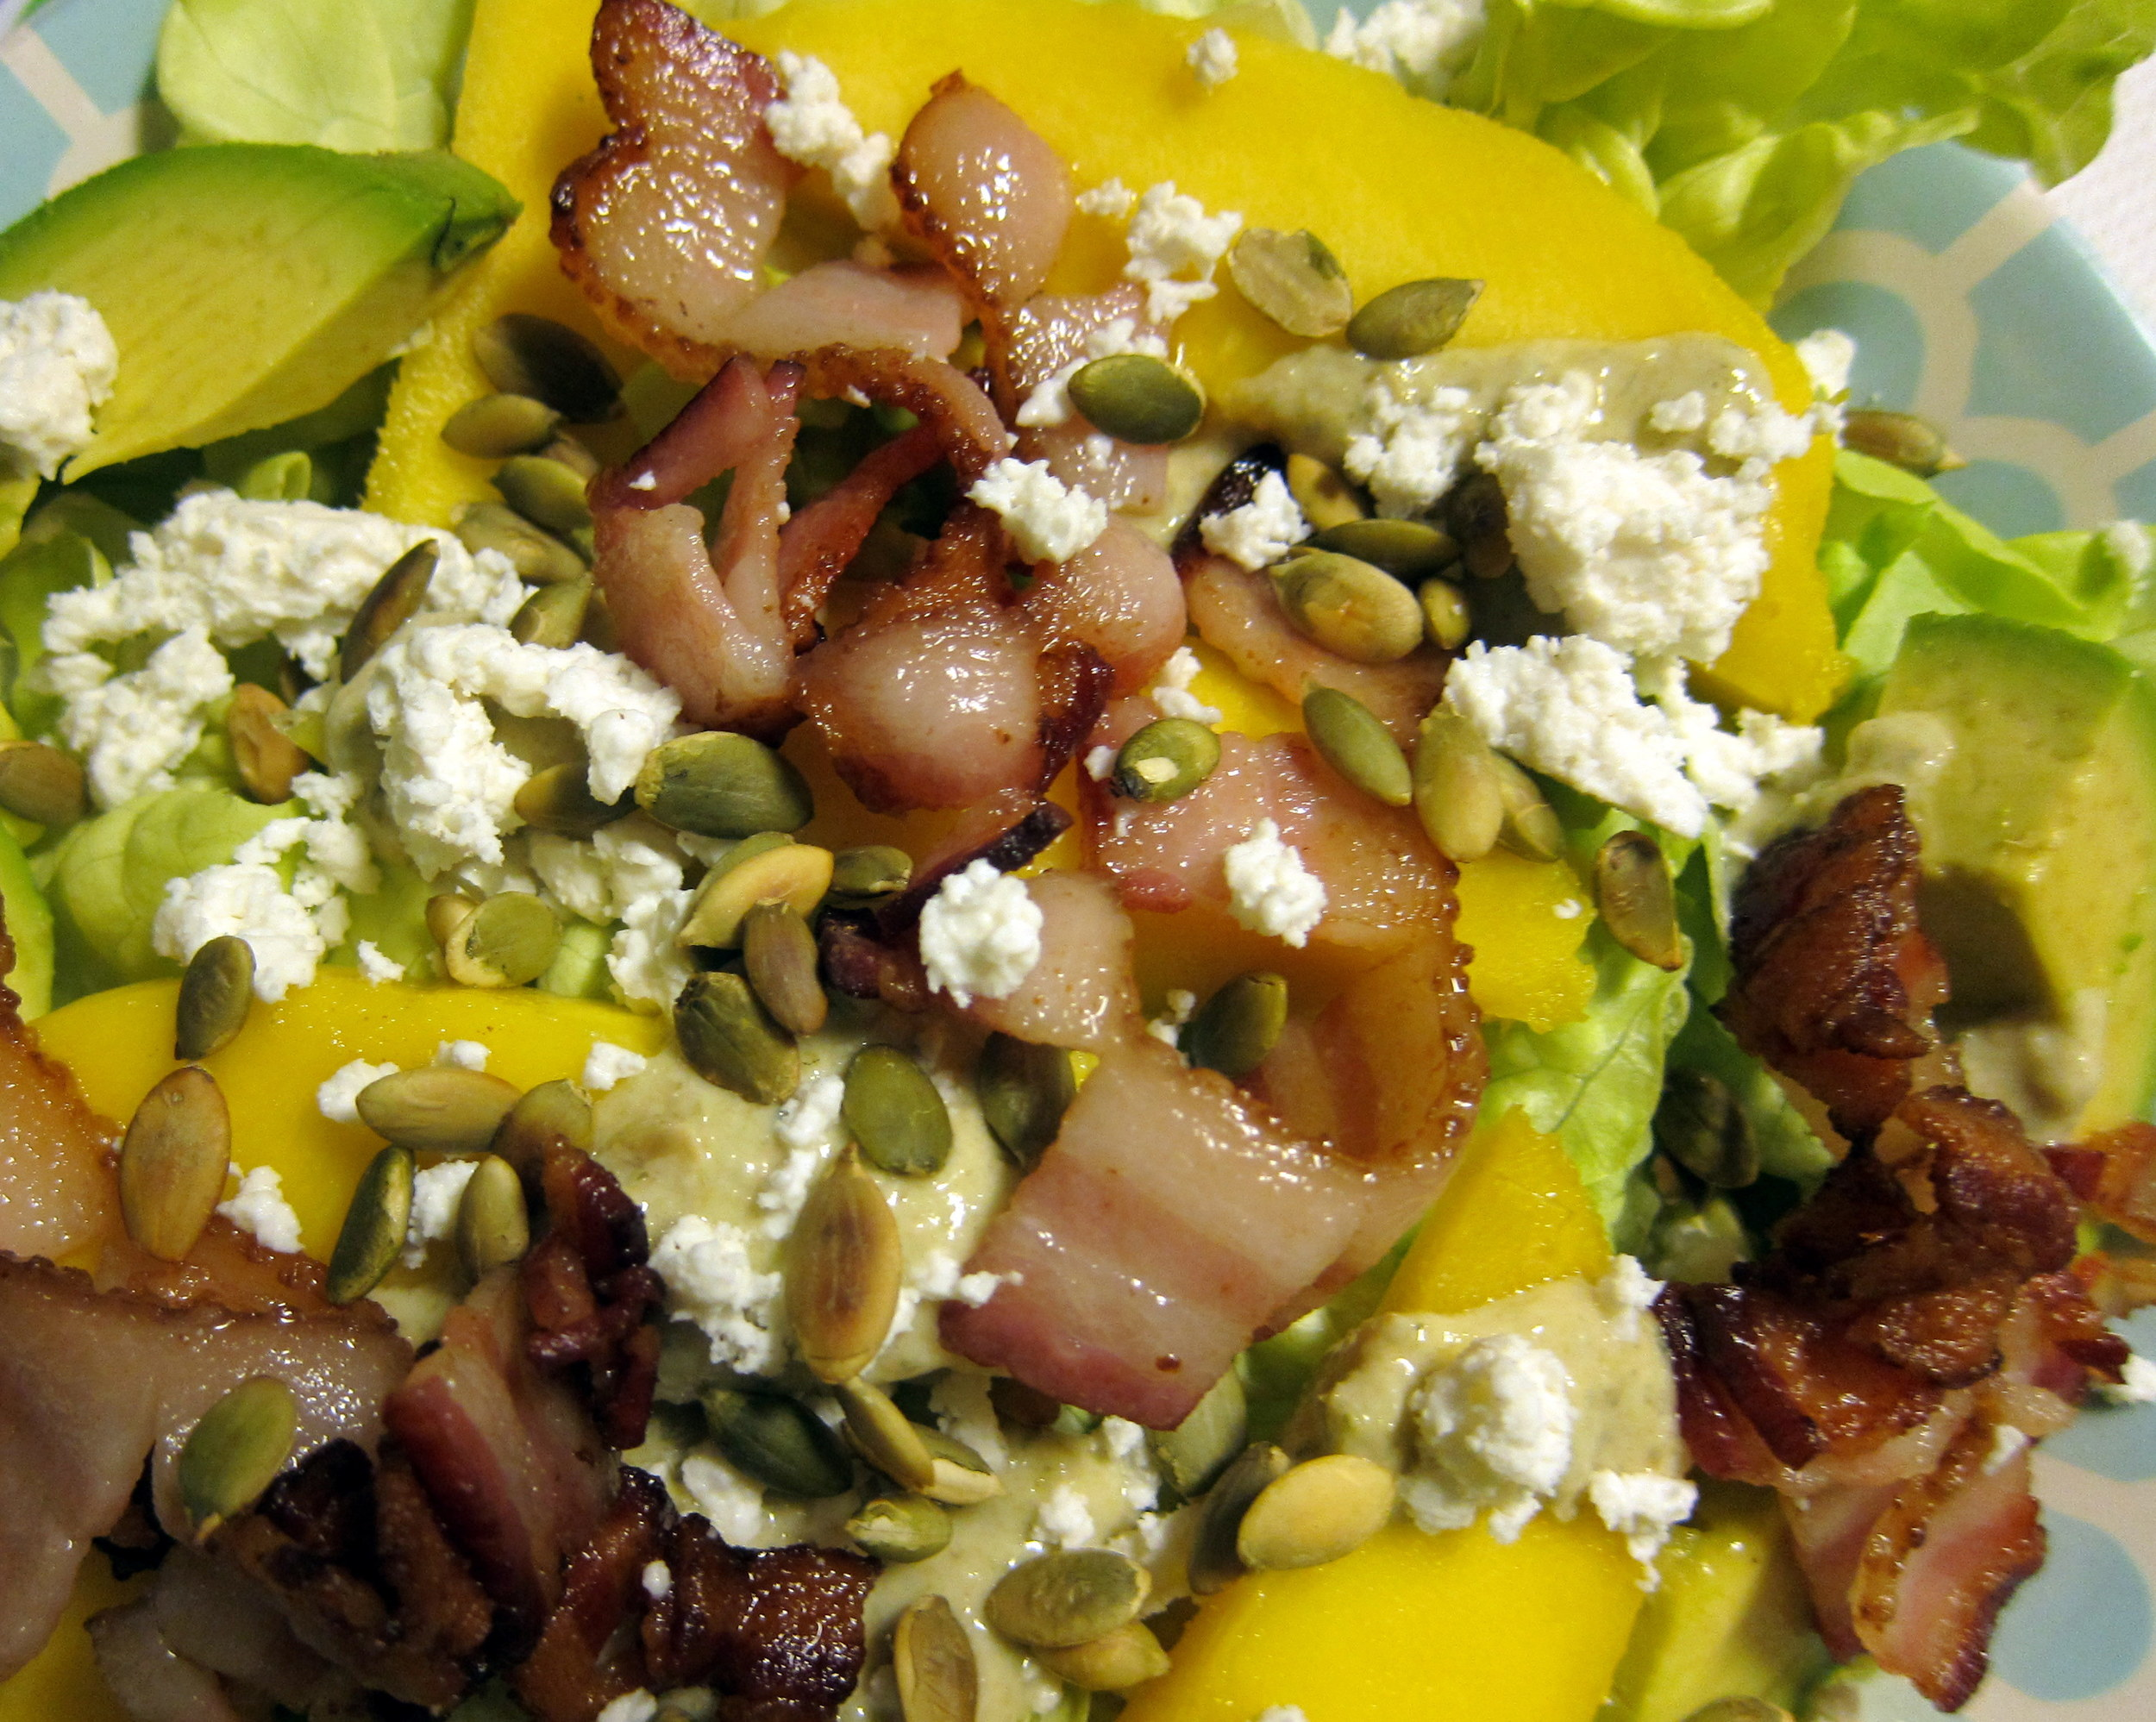 Ensalada de Aguacate y Mango con Queso Fresco, Tocino y Pepitas Tostadas: Avocado-Mango Salad with FResh Cheese, BAcon and Toasted Pumpkin SEeds